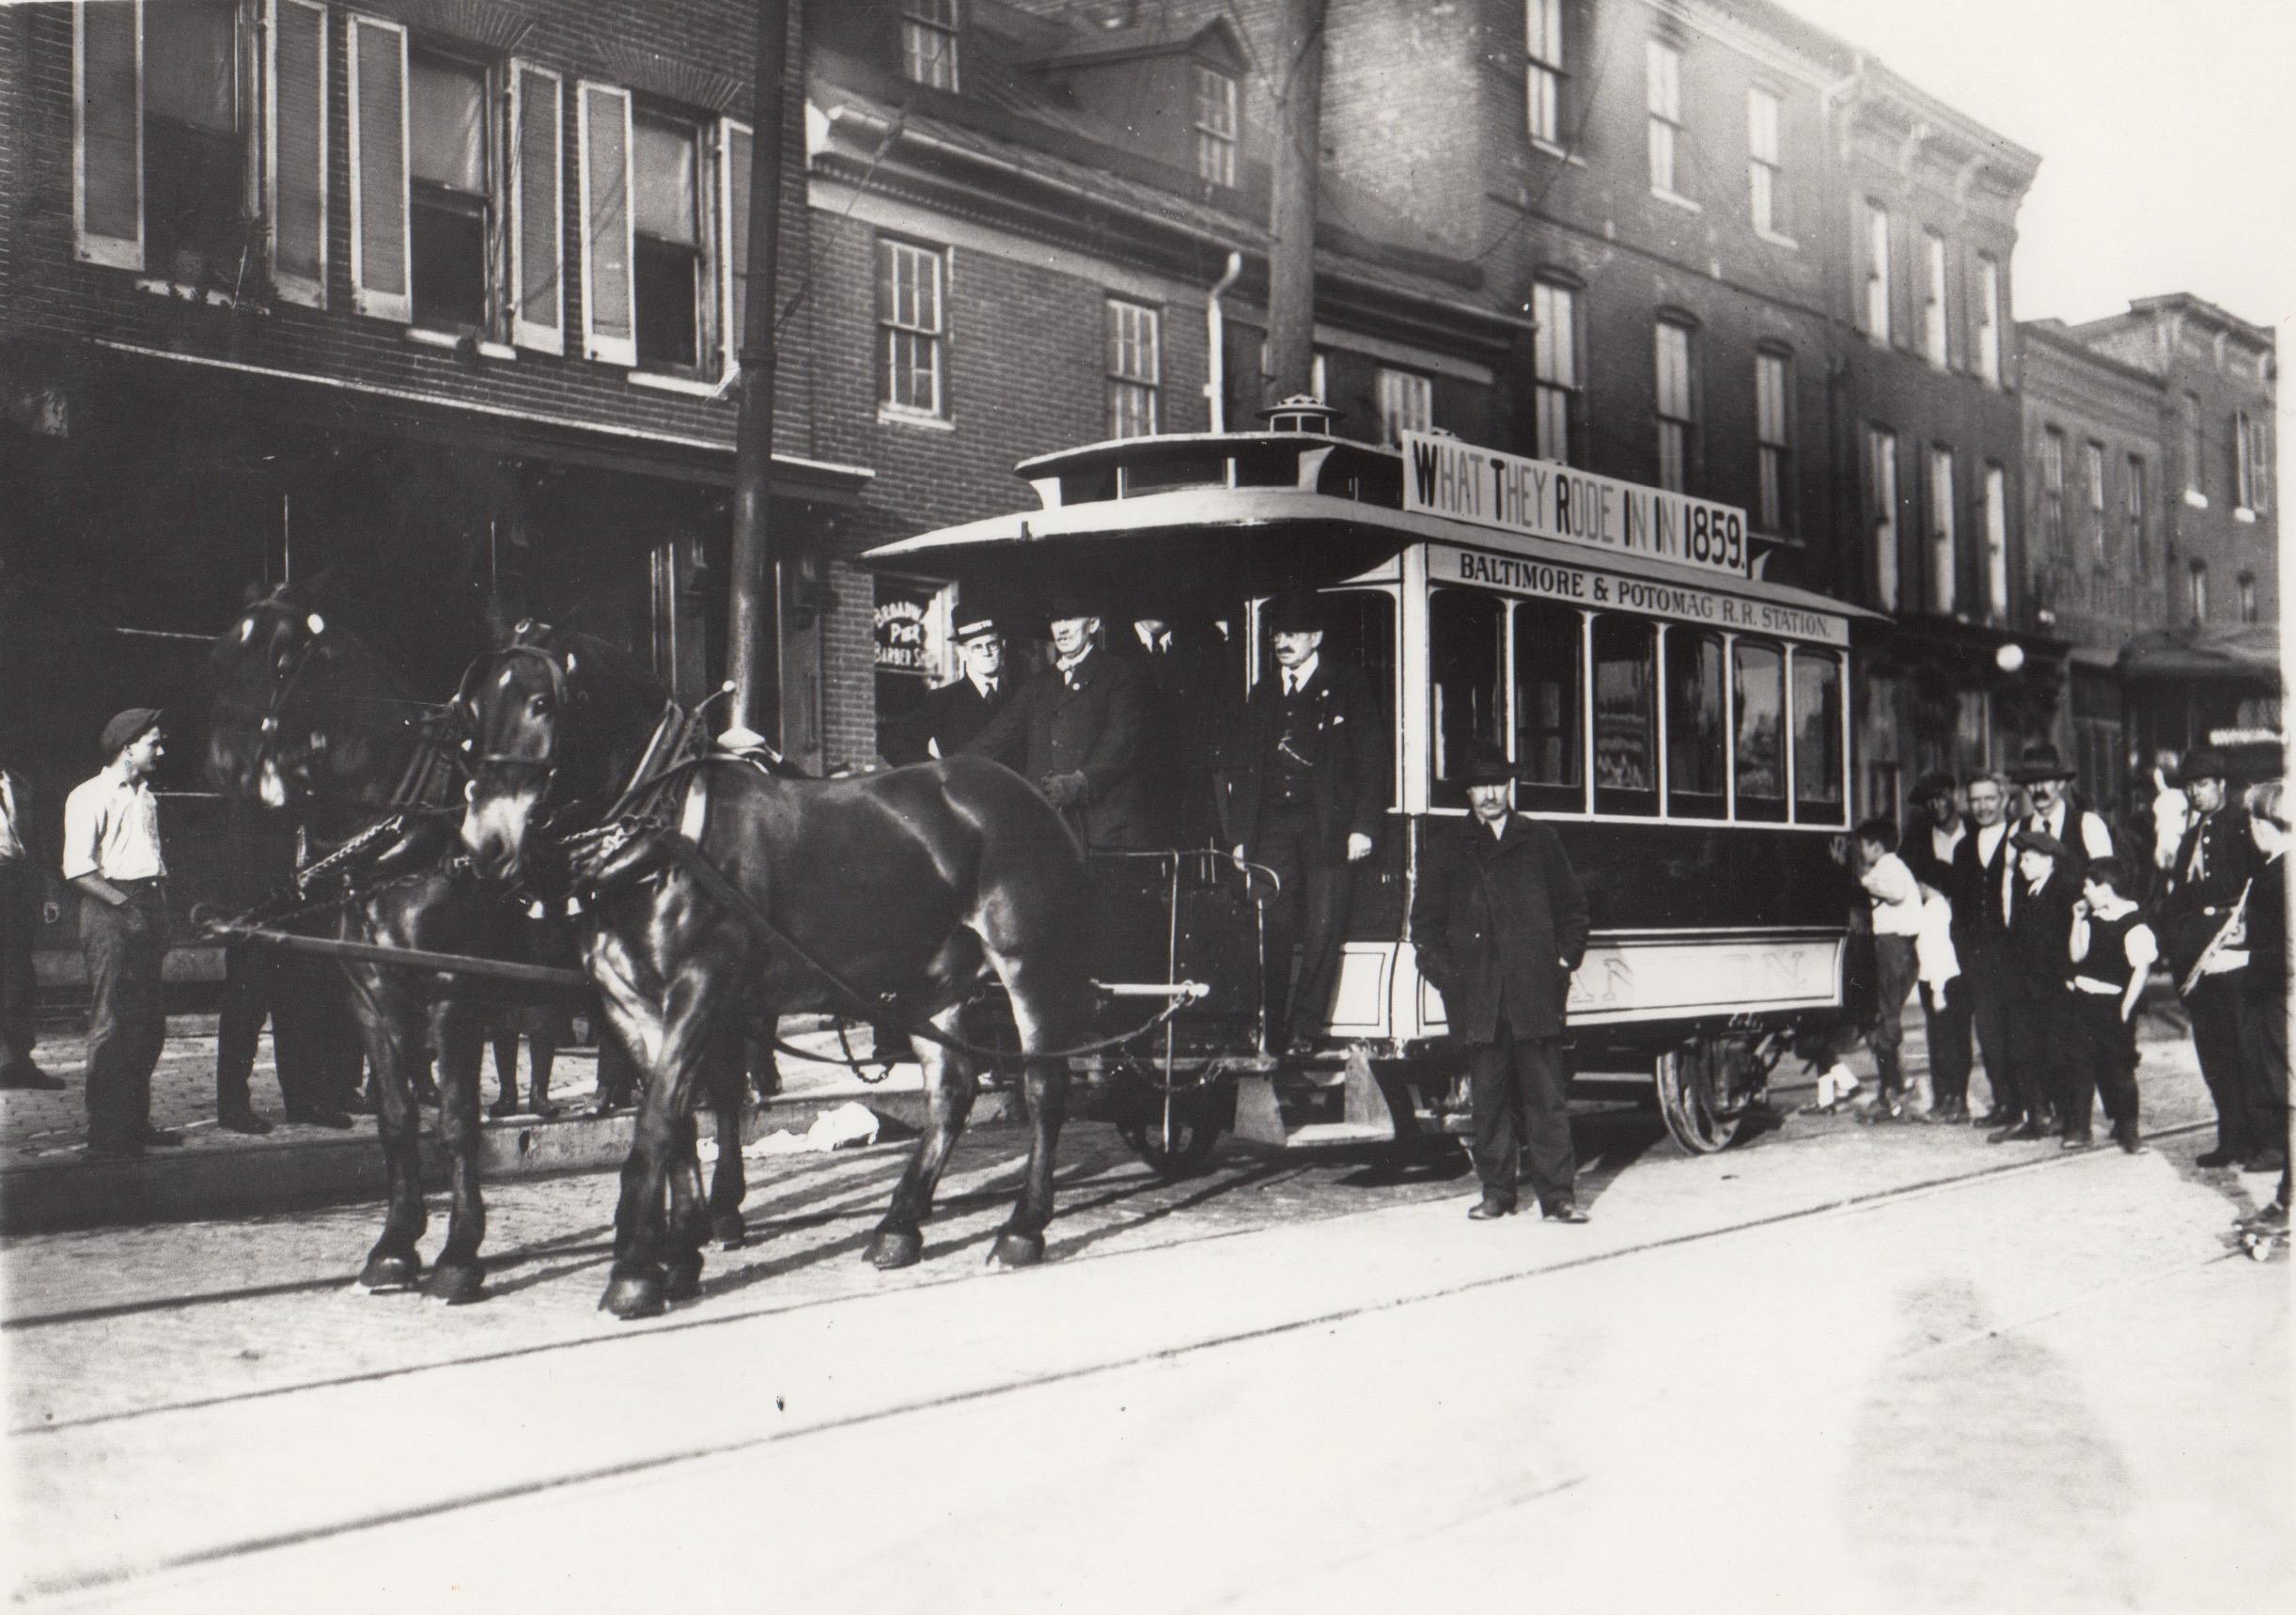 Image Credit: GF Nixon, Thames Street Horsecar Barn